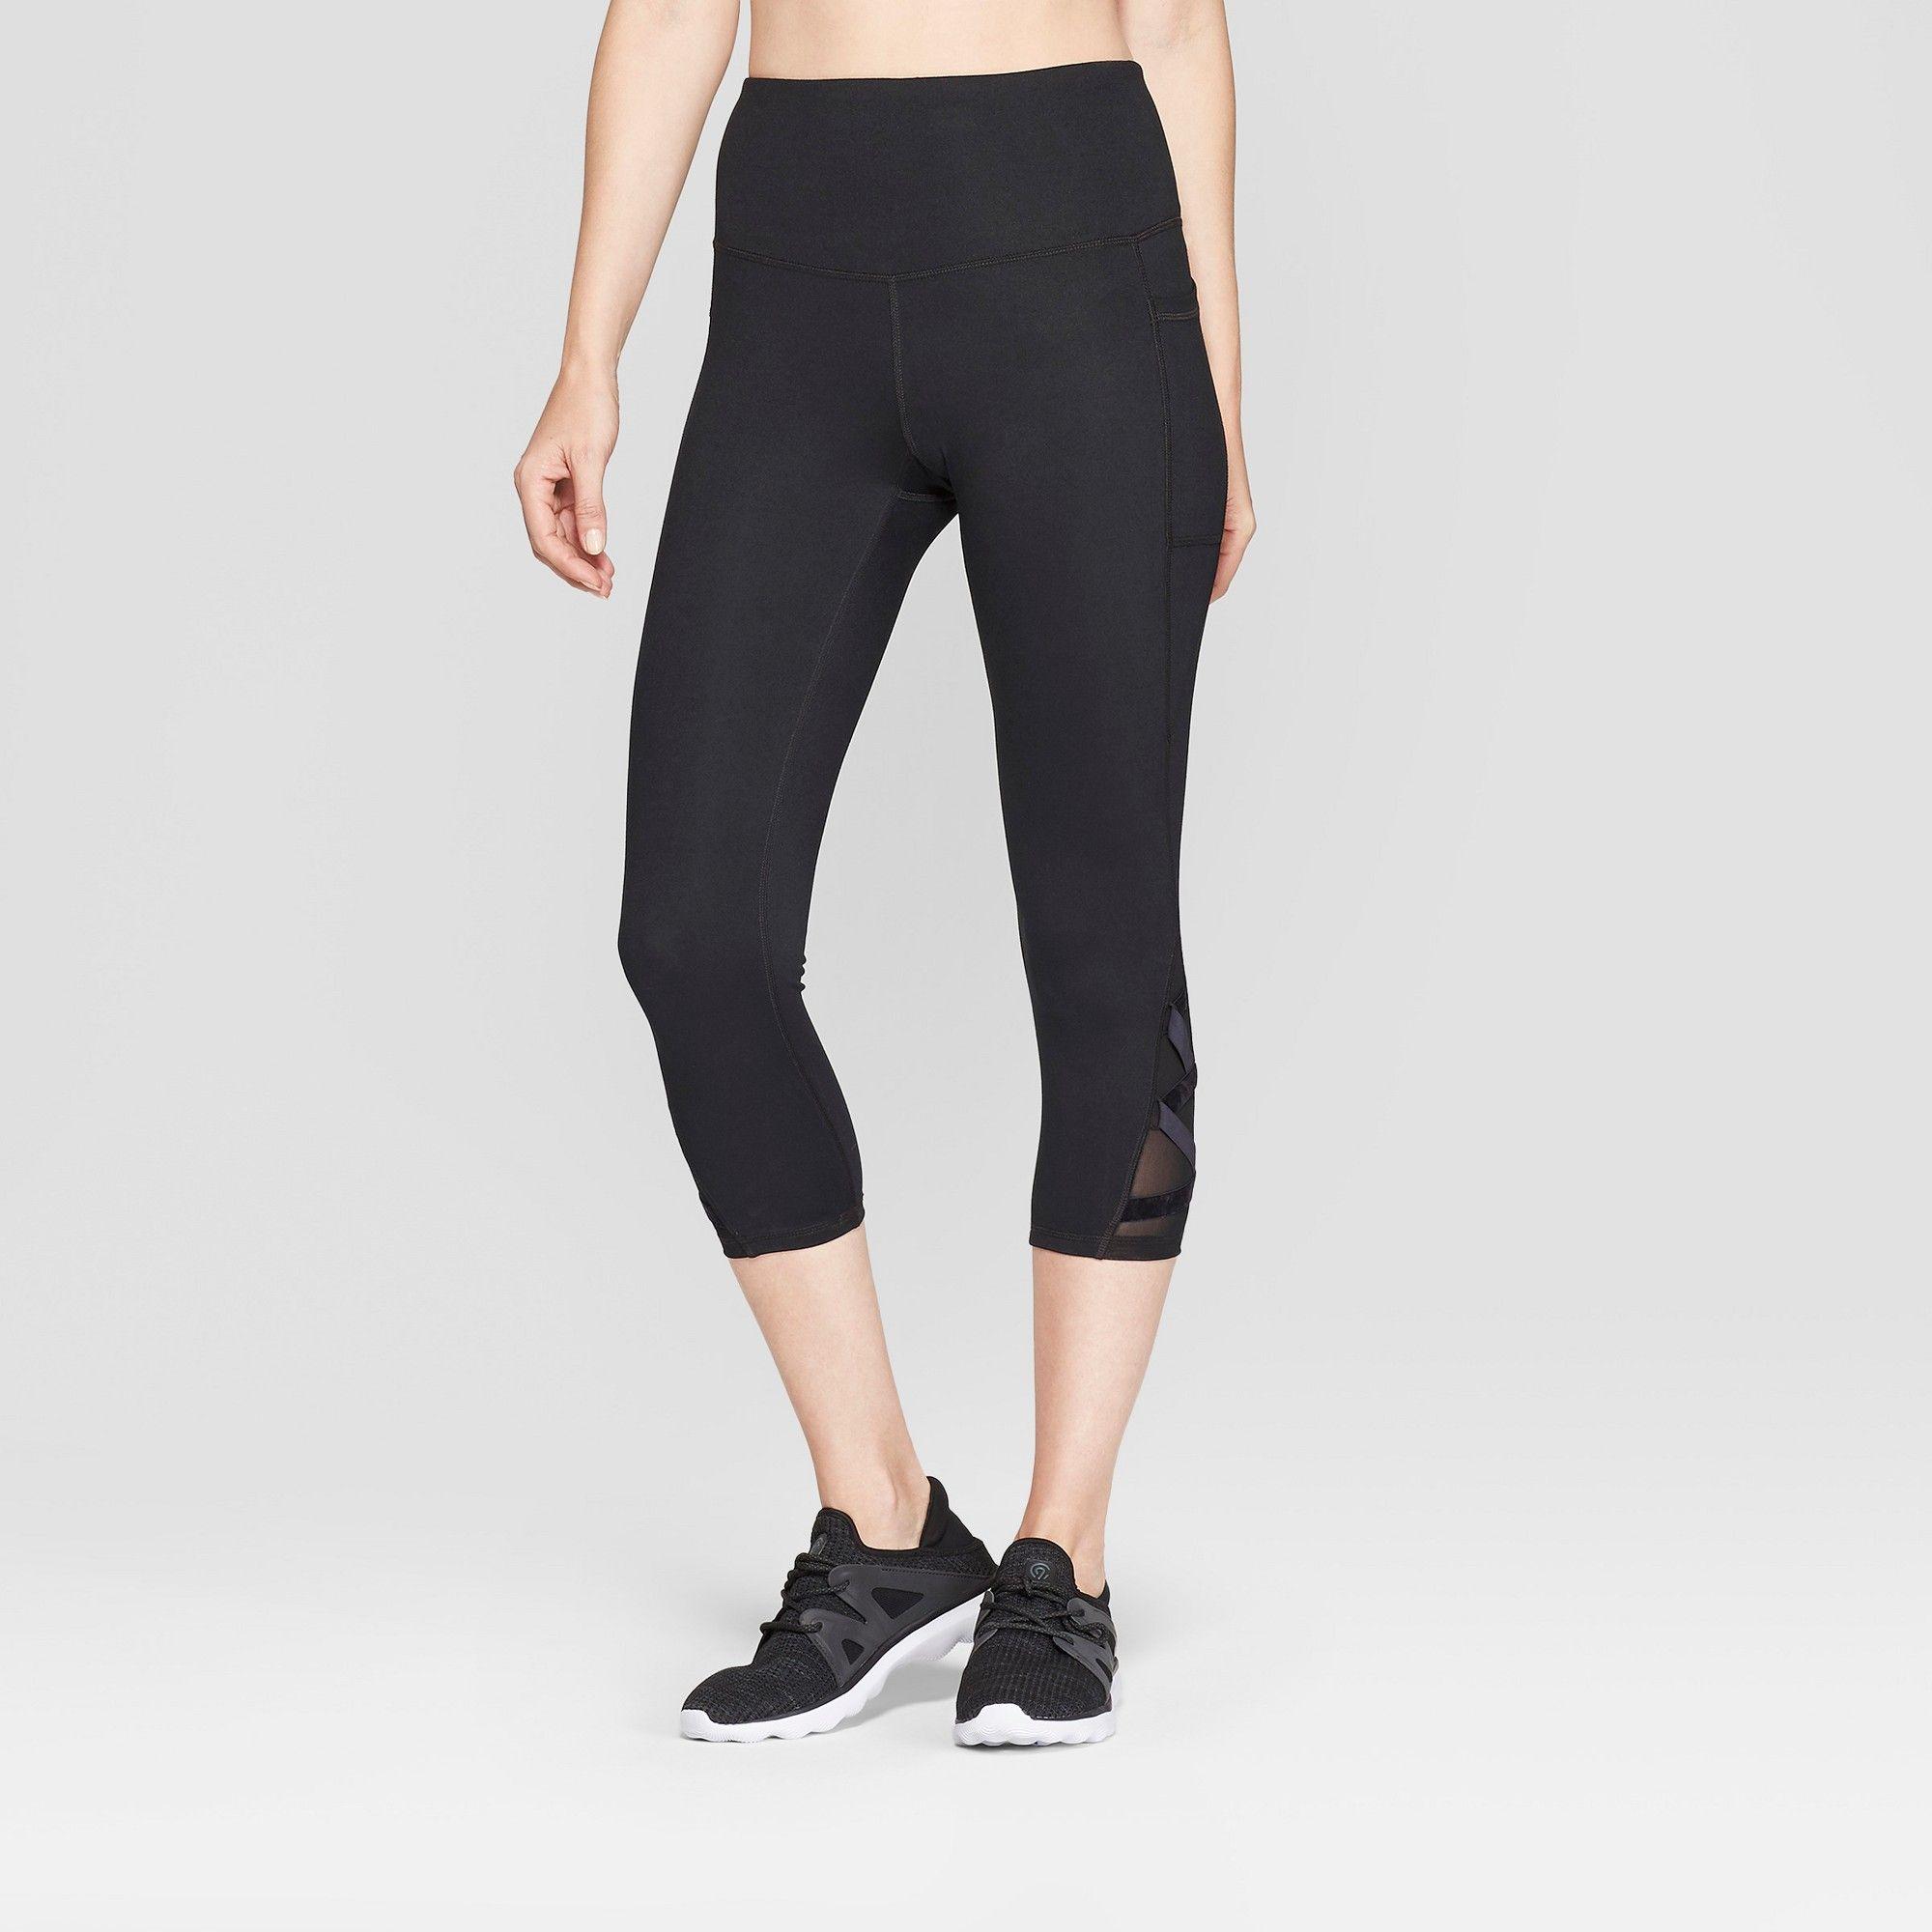 dd90e63f47359 Women's Studio High-Waisted Capri Leggings - C9 Champion Black XL ...